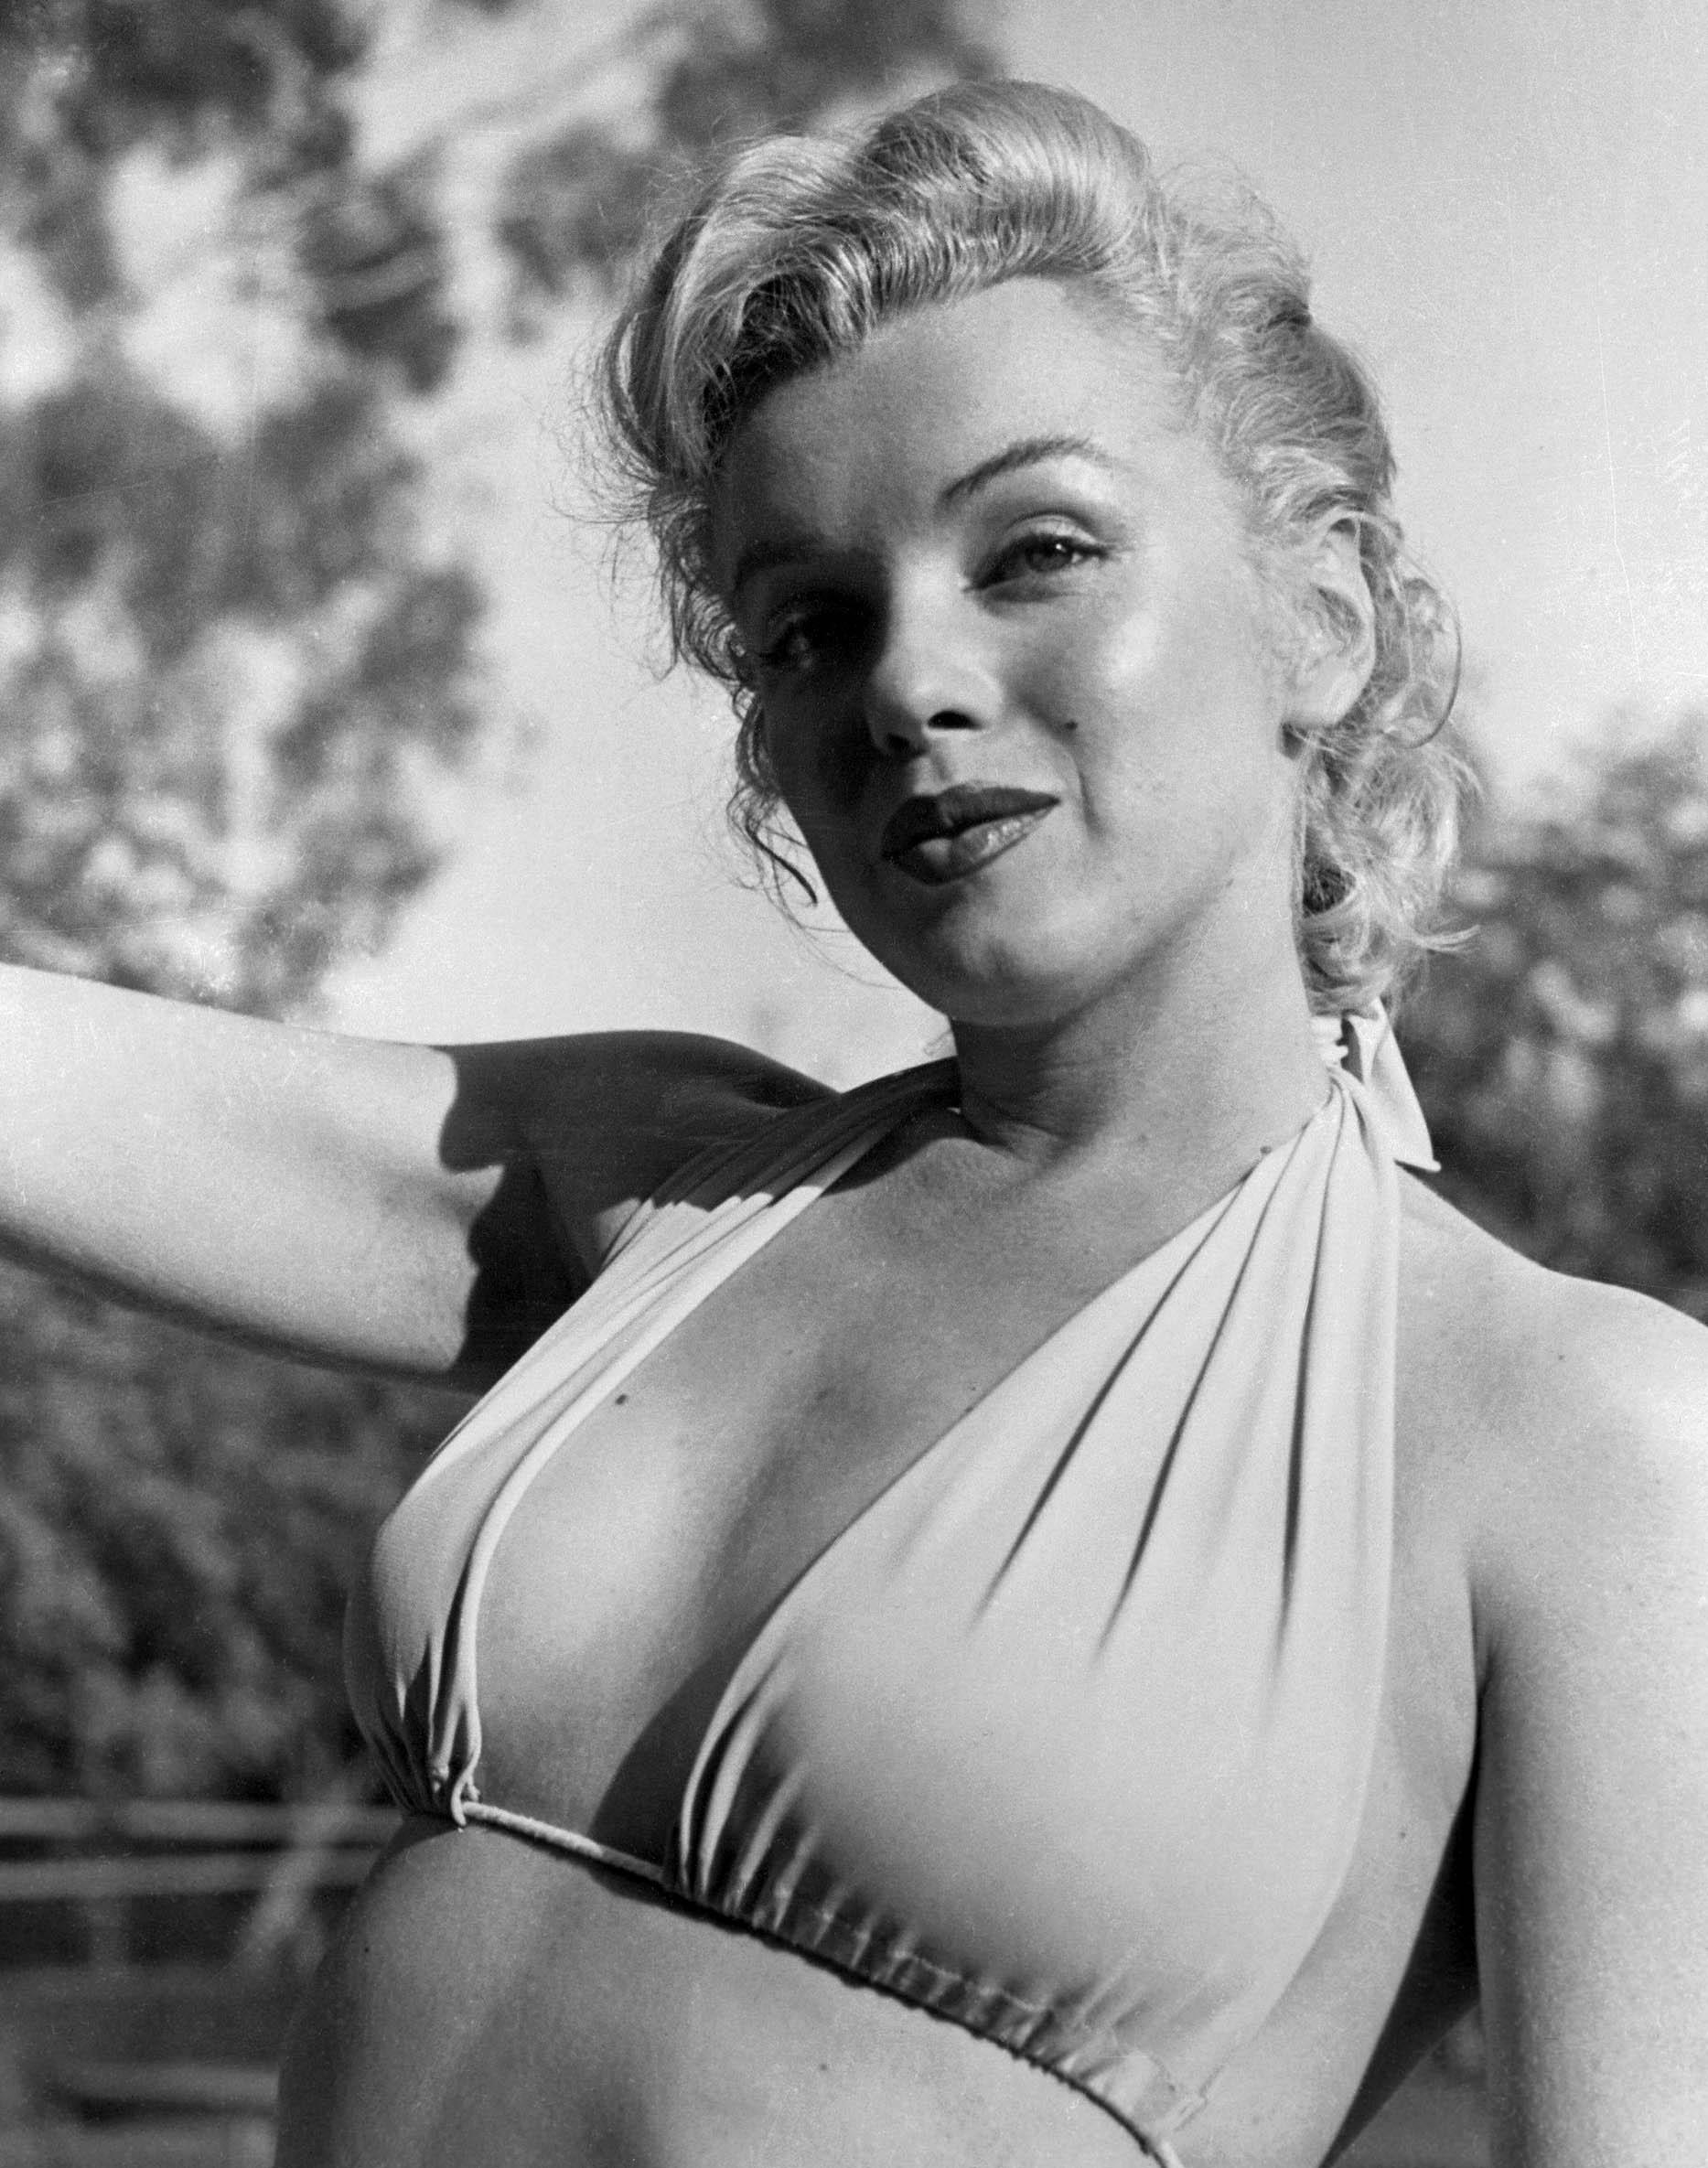 Annex - Monroe, Marilyn_022